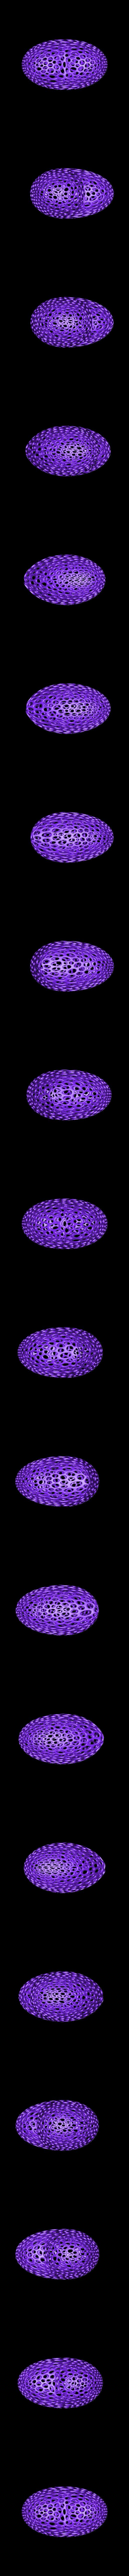 Heart_-_Voronoi_B.stl Download free STL file Heart - Voronoi Style • 3D printable object, Numbmond